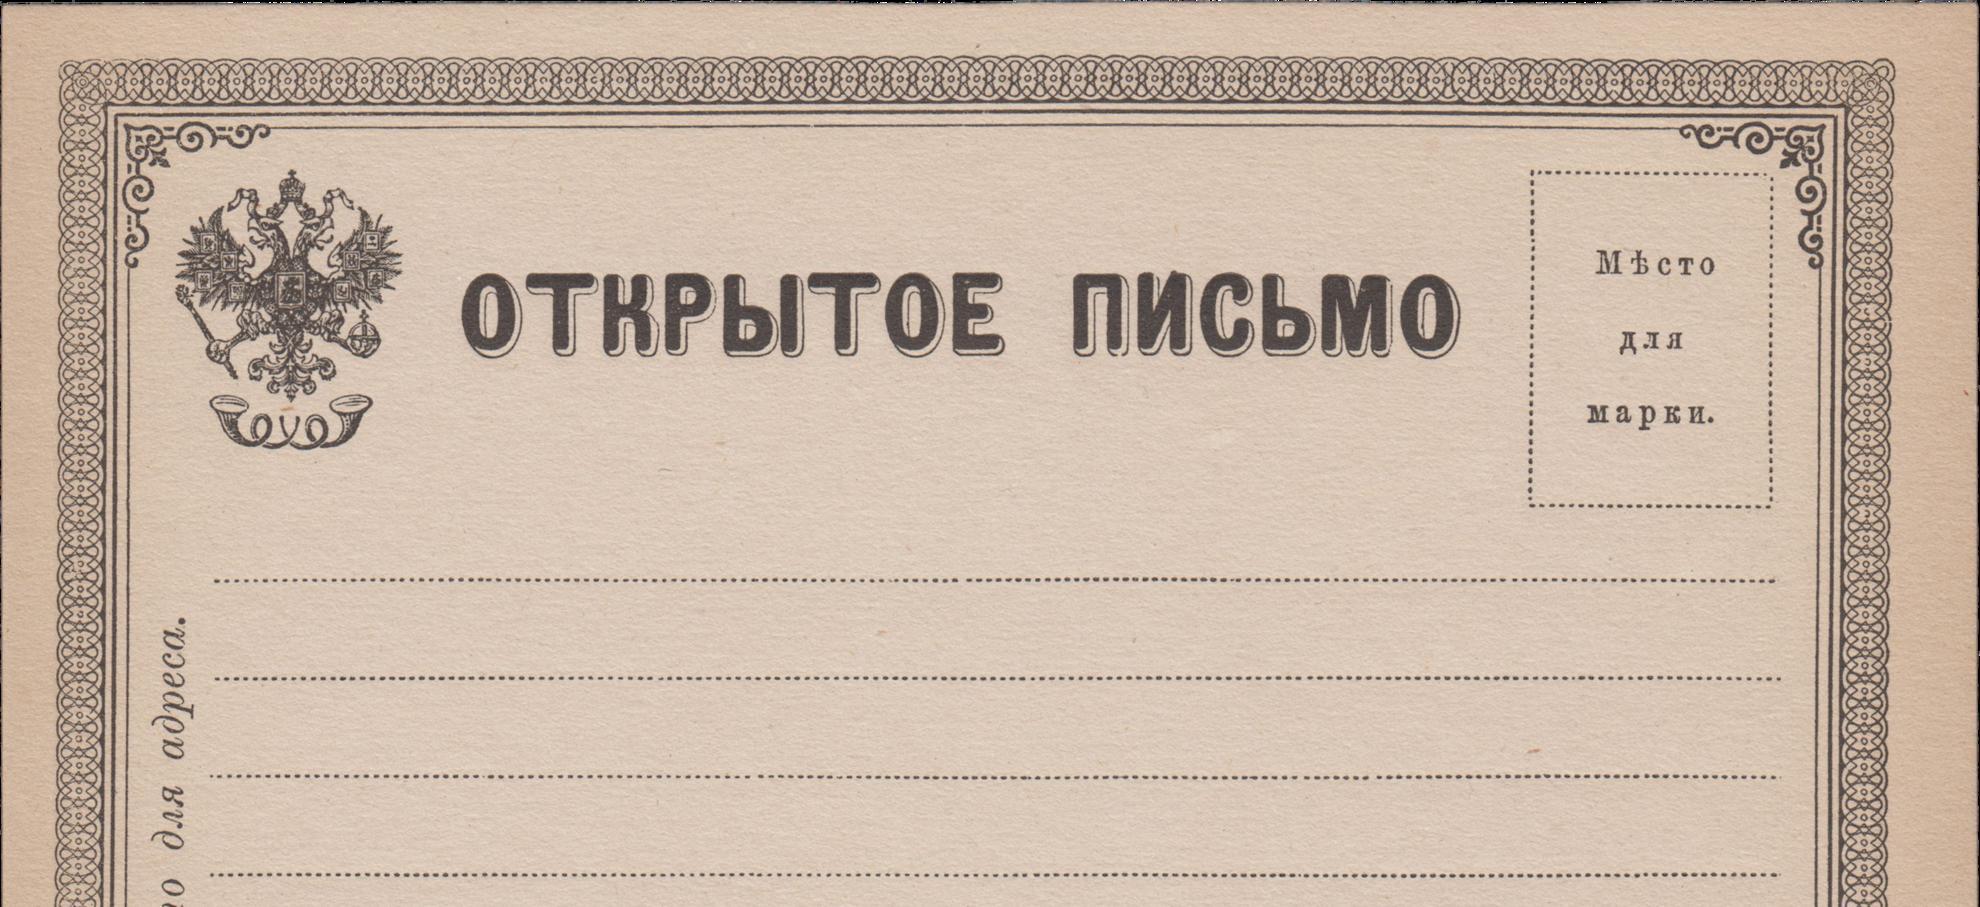 Самая старая почтовая открытка